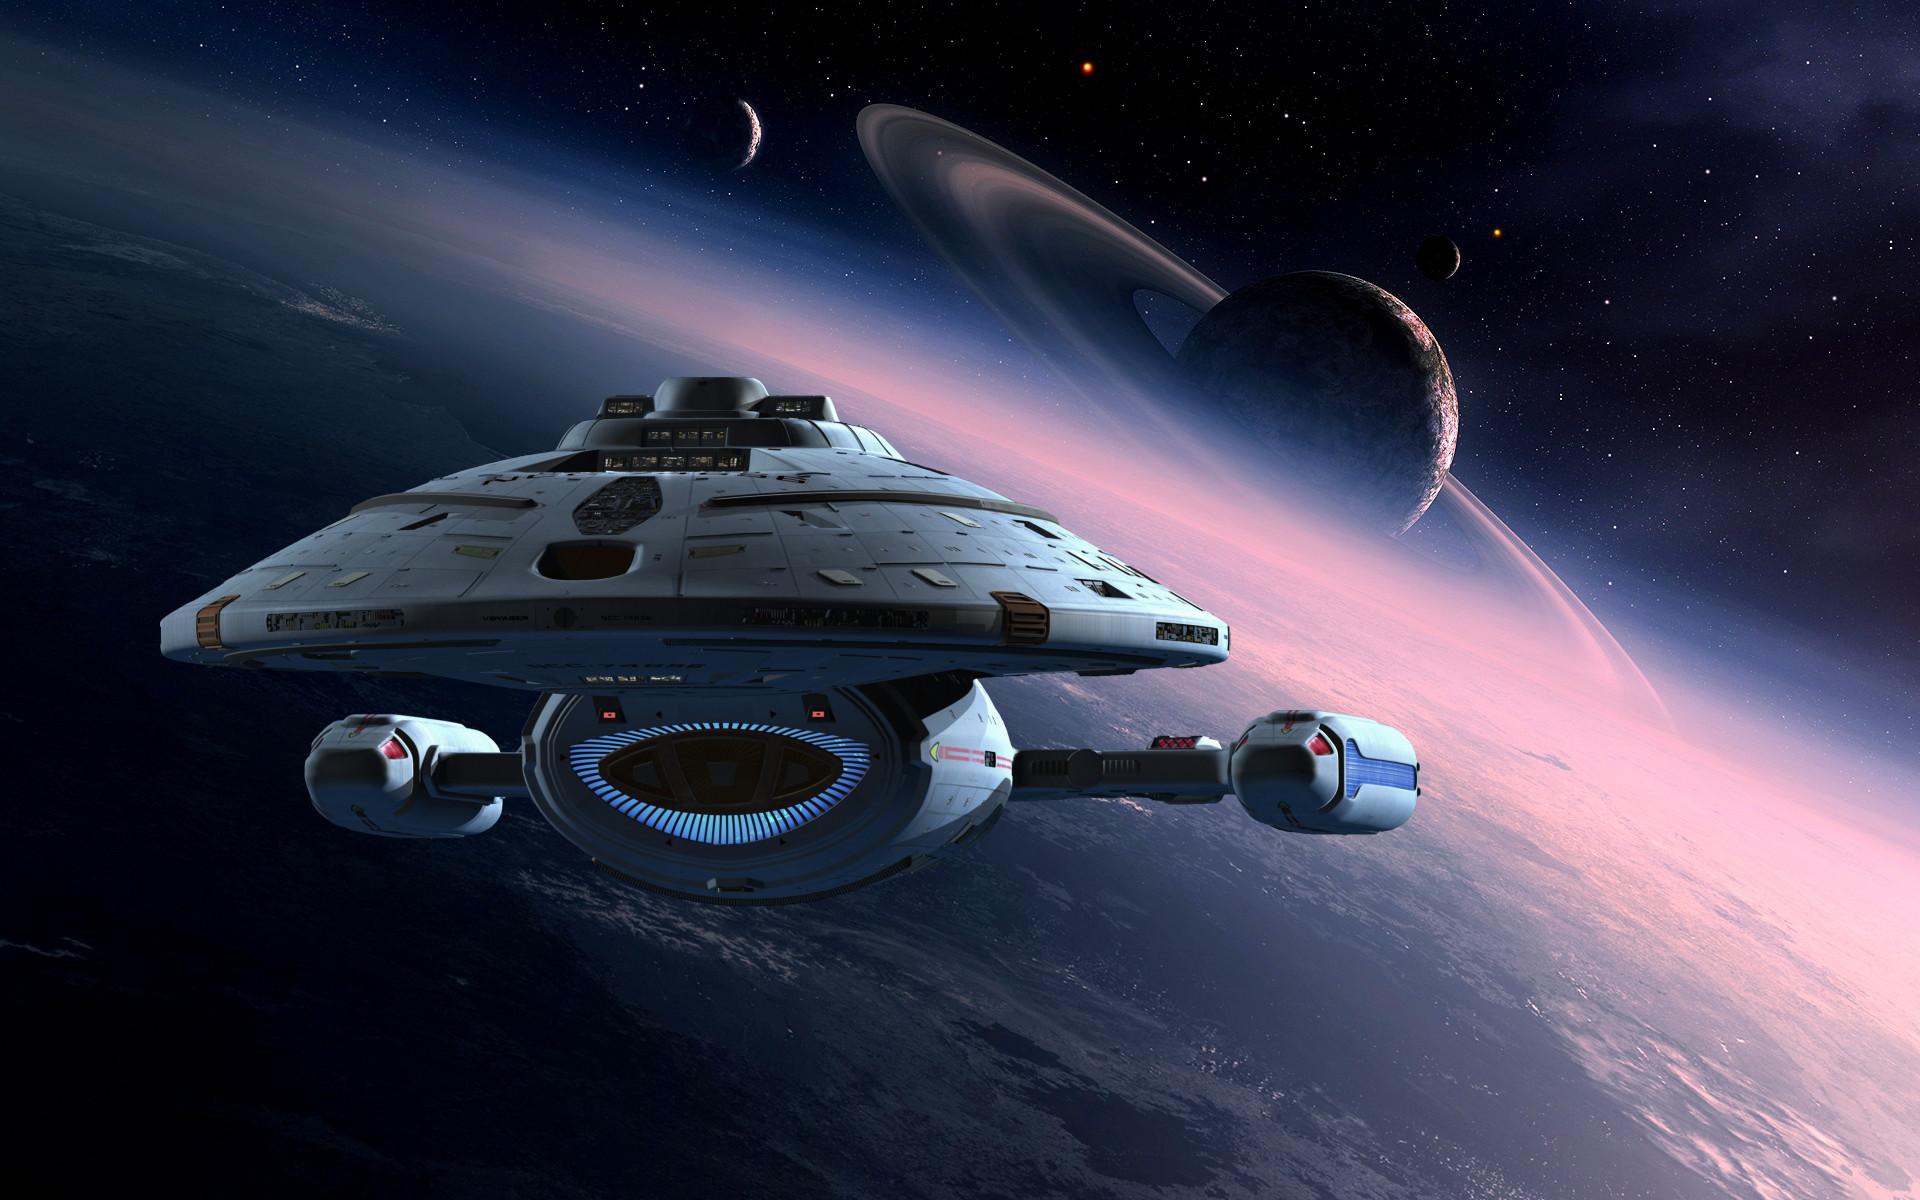 Star Trek Voyager Wallpapers (69+ images)